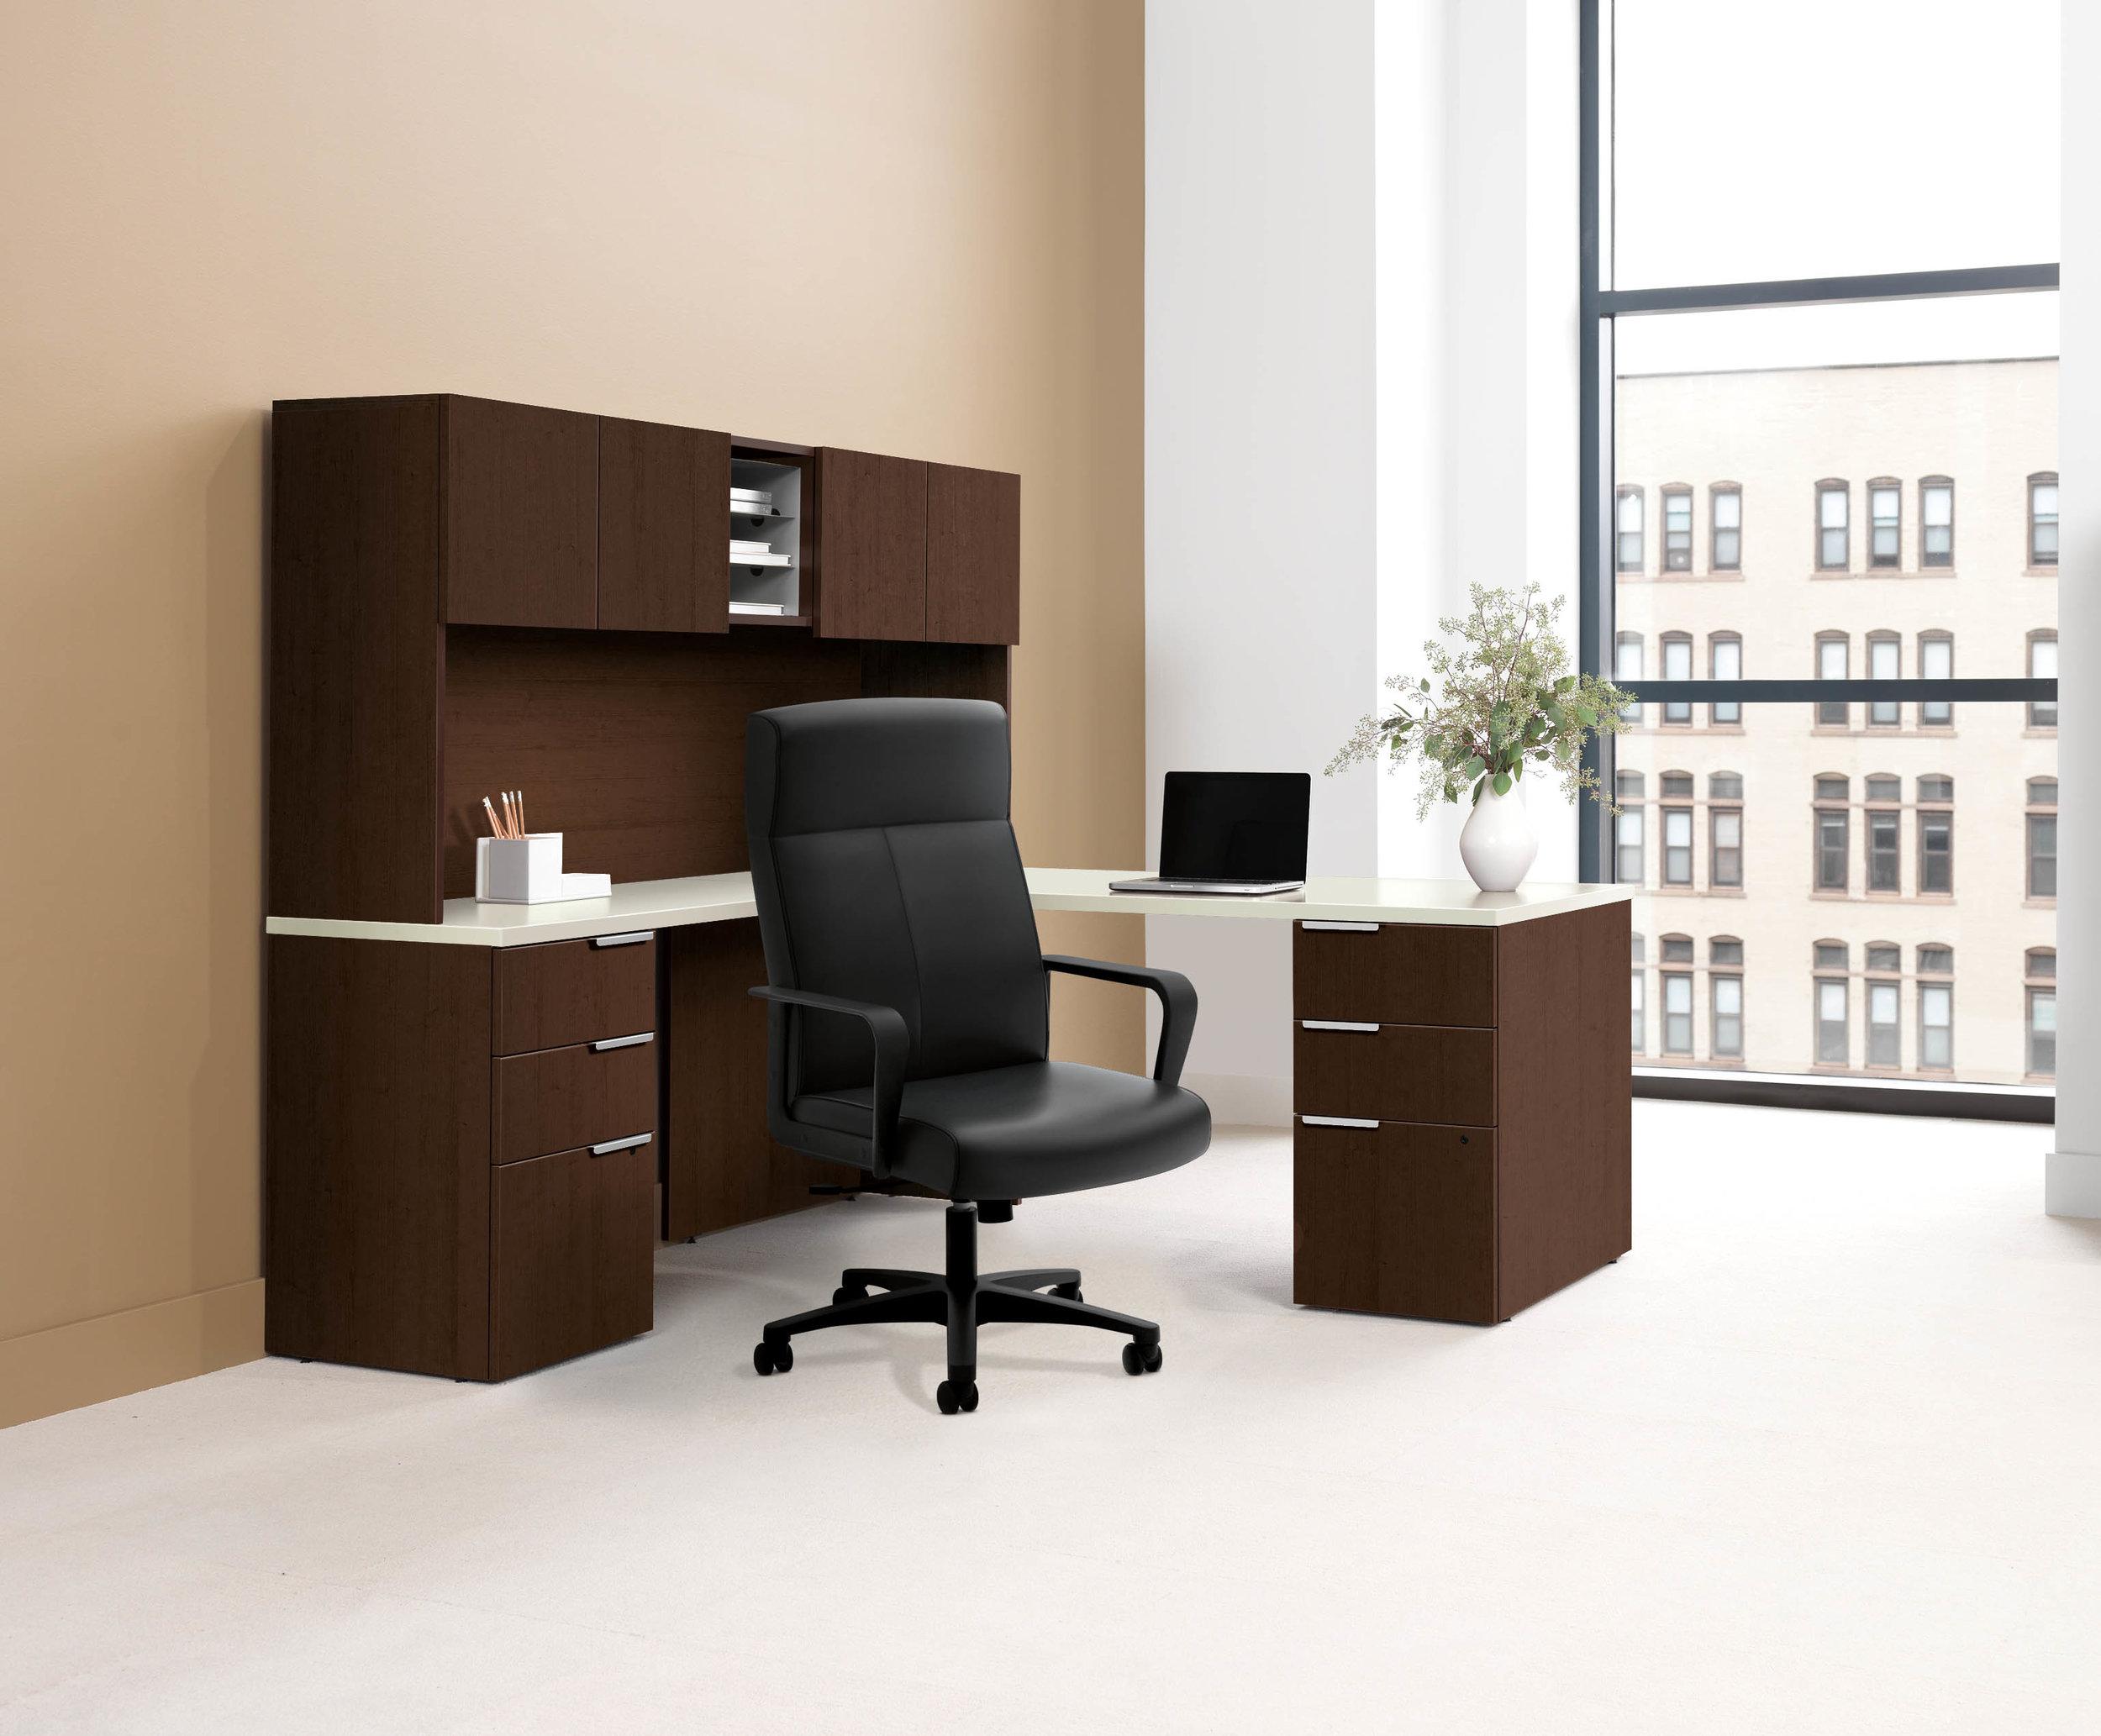 ConventionalPrivateOffice-bookcaseLateralMOCH_1_HVL604.jpg